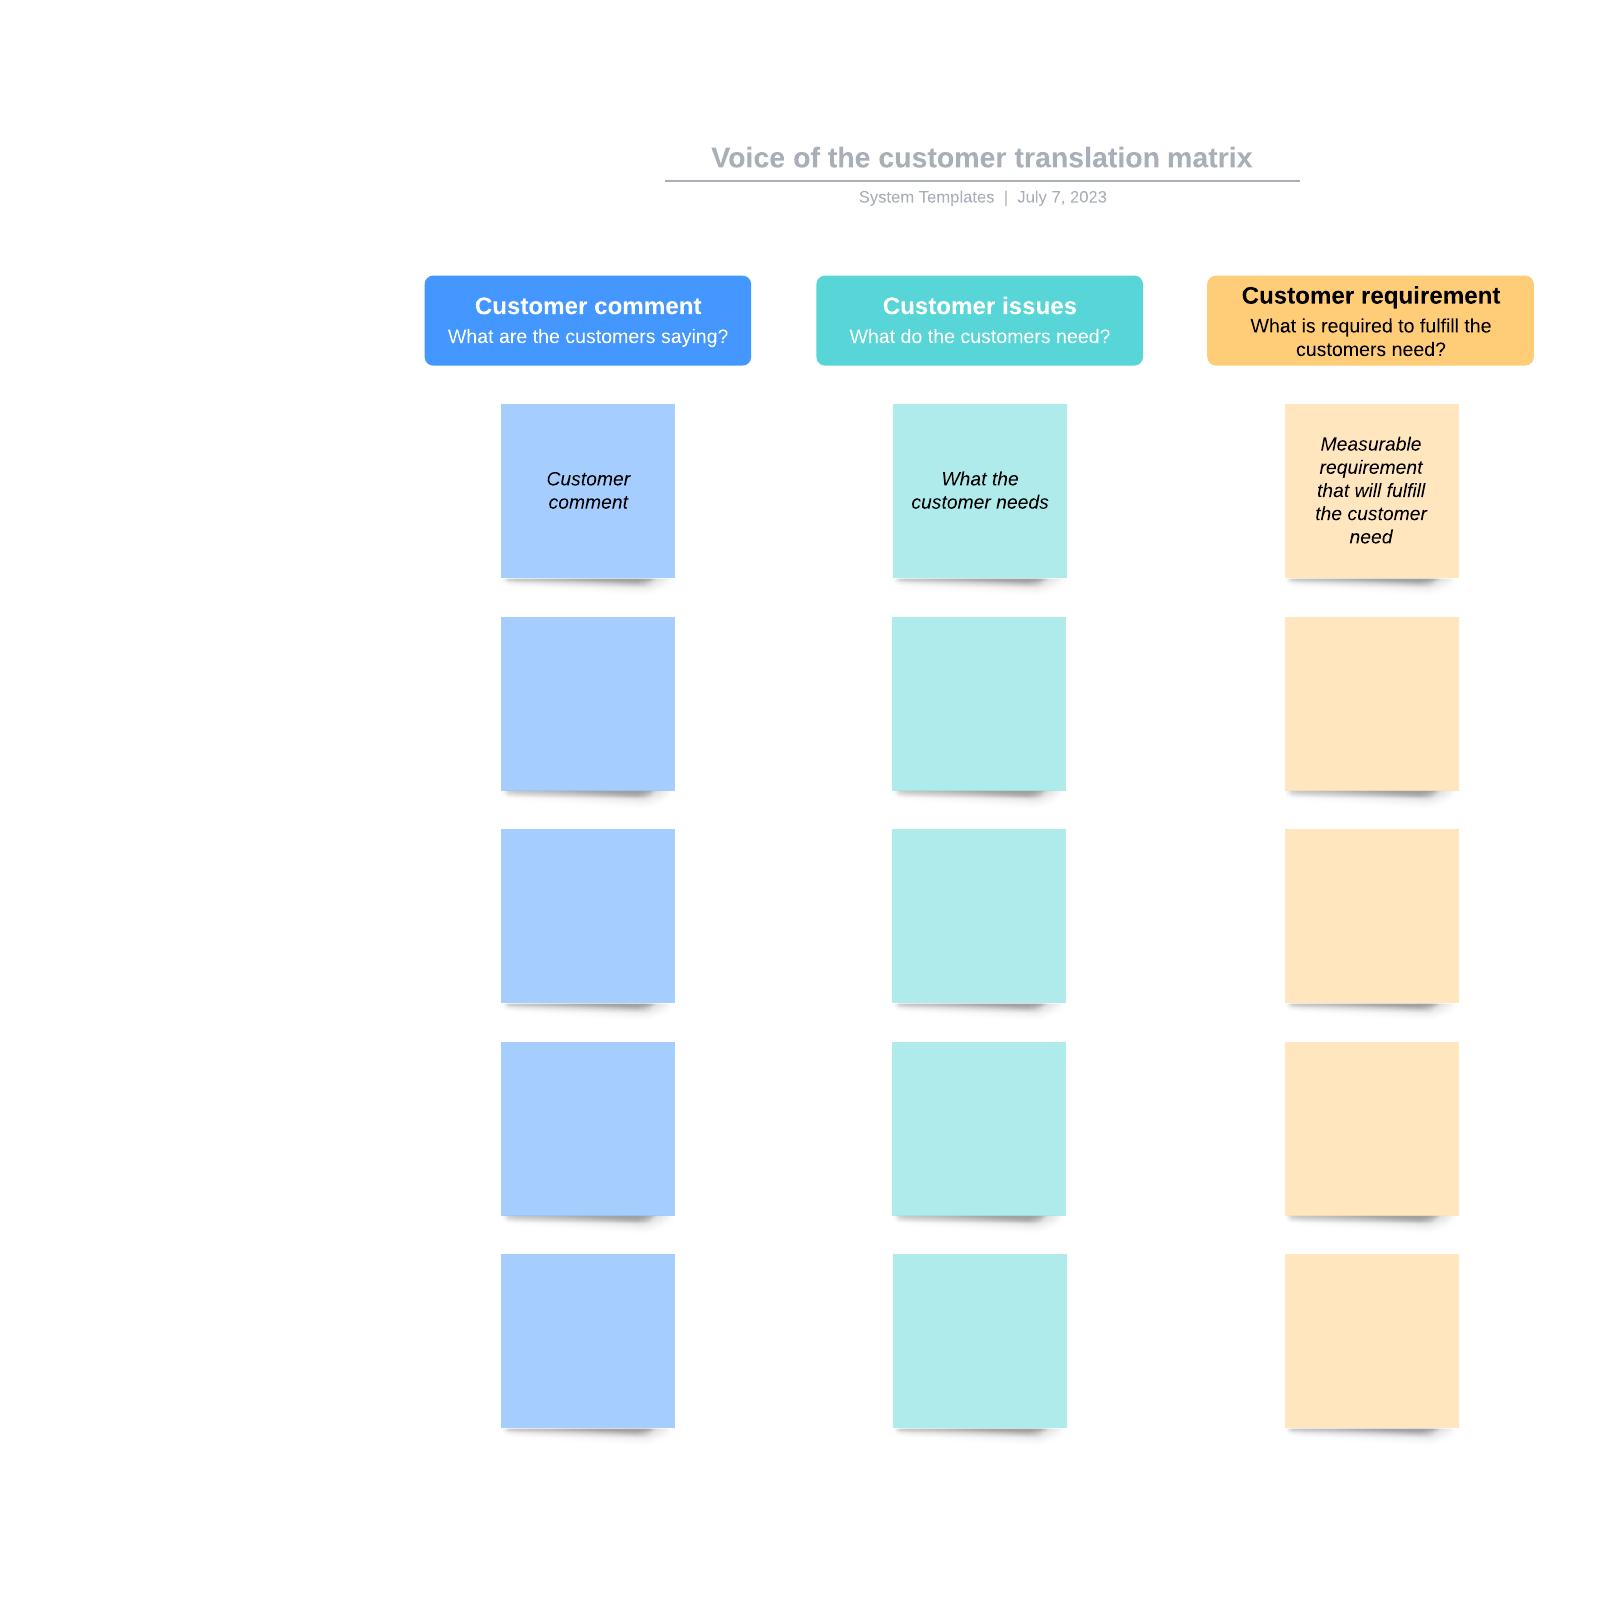 Voice of the Customer translation matrix